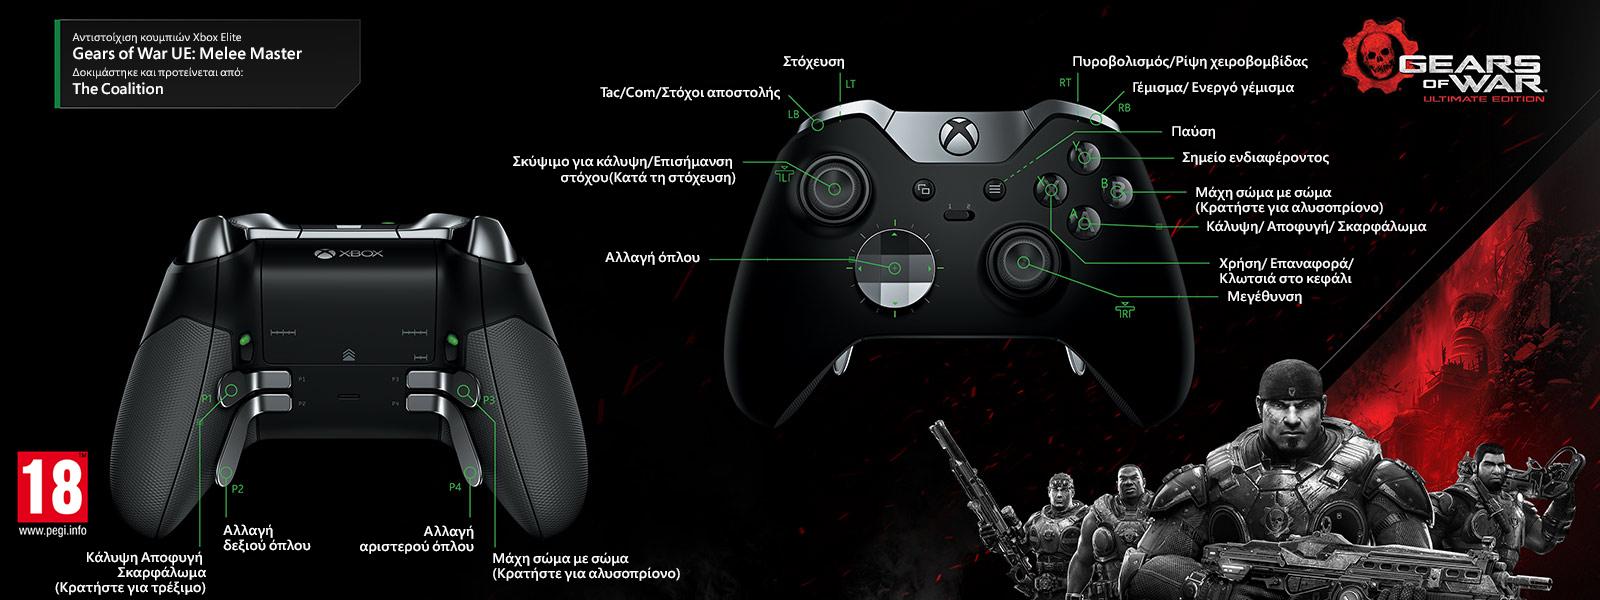 Gears of Wars Ultimate Edition – Χαρτογράφηση Melee Master Multiplayer Elite